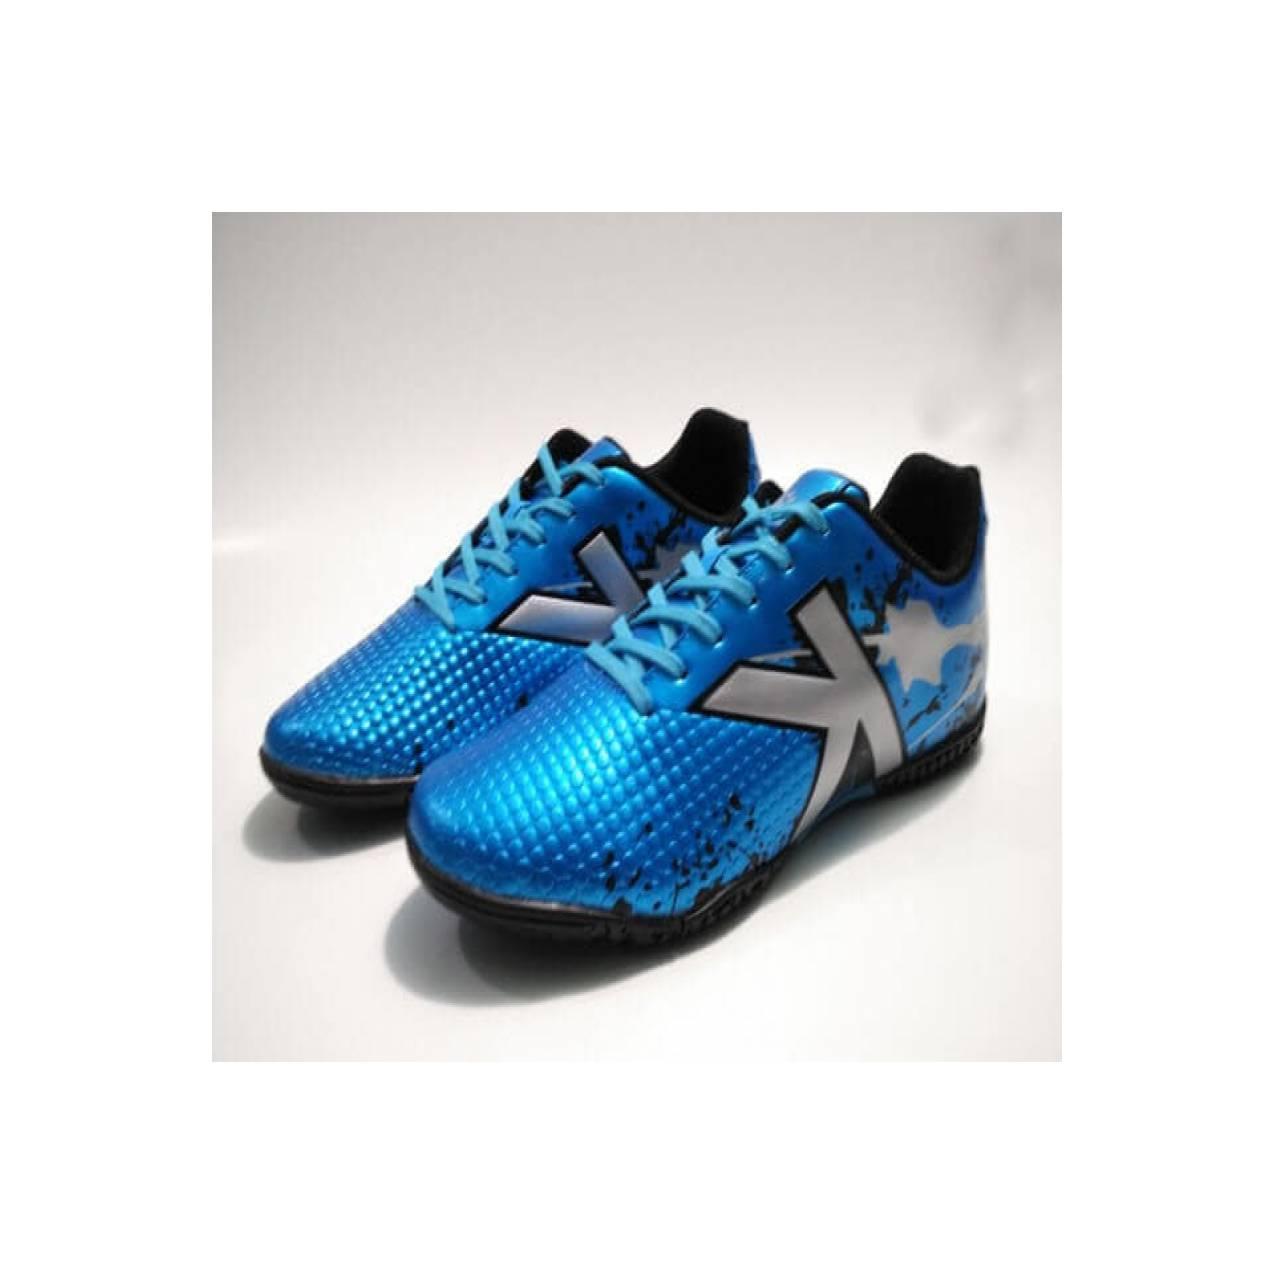 Ogardo Pele Sepatu Futsal Pria Blue Orange Daftar Harga Terbaru Nike Hypervenom Phelon Ii Ic 749898 703 Hijau Kelme Star Evo Sky Silver